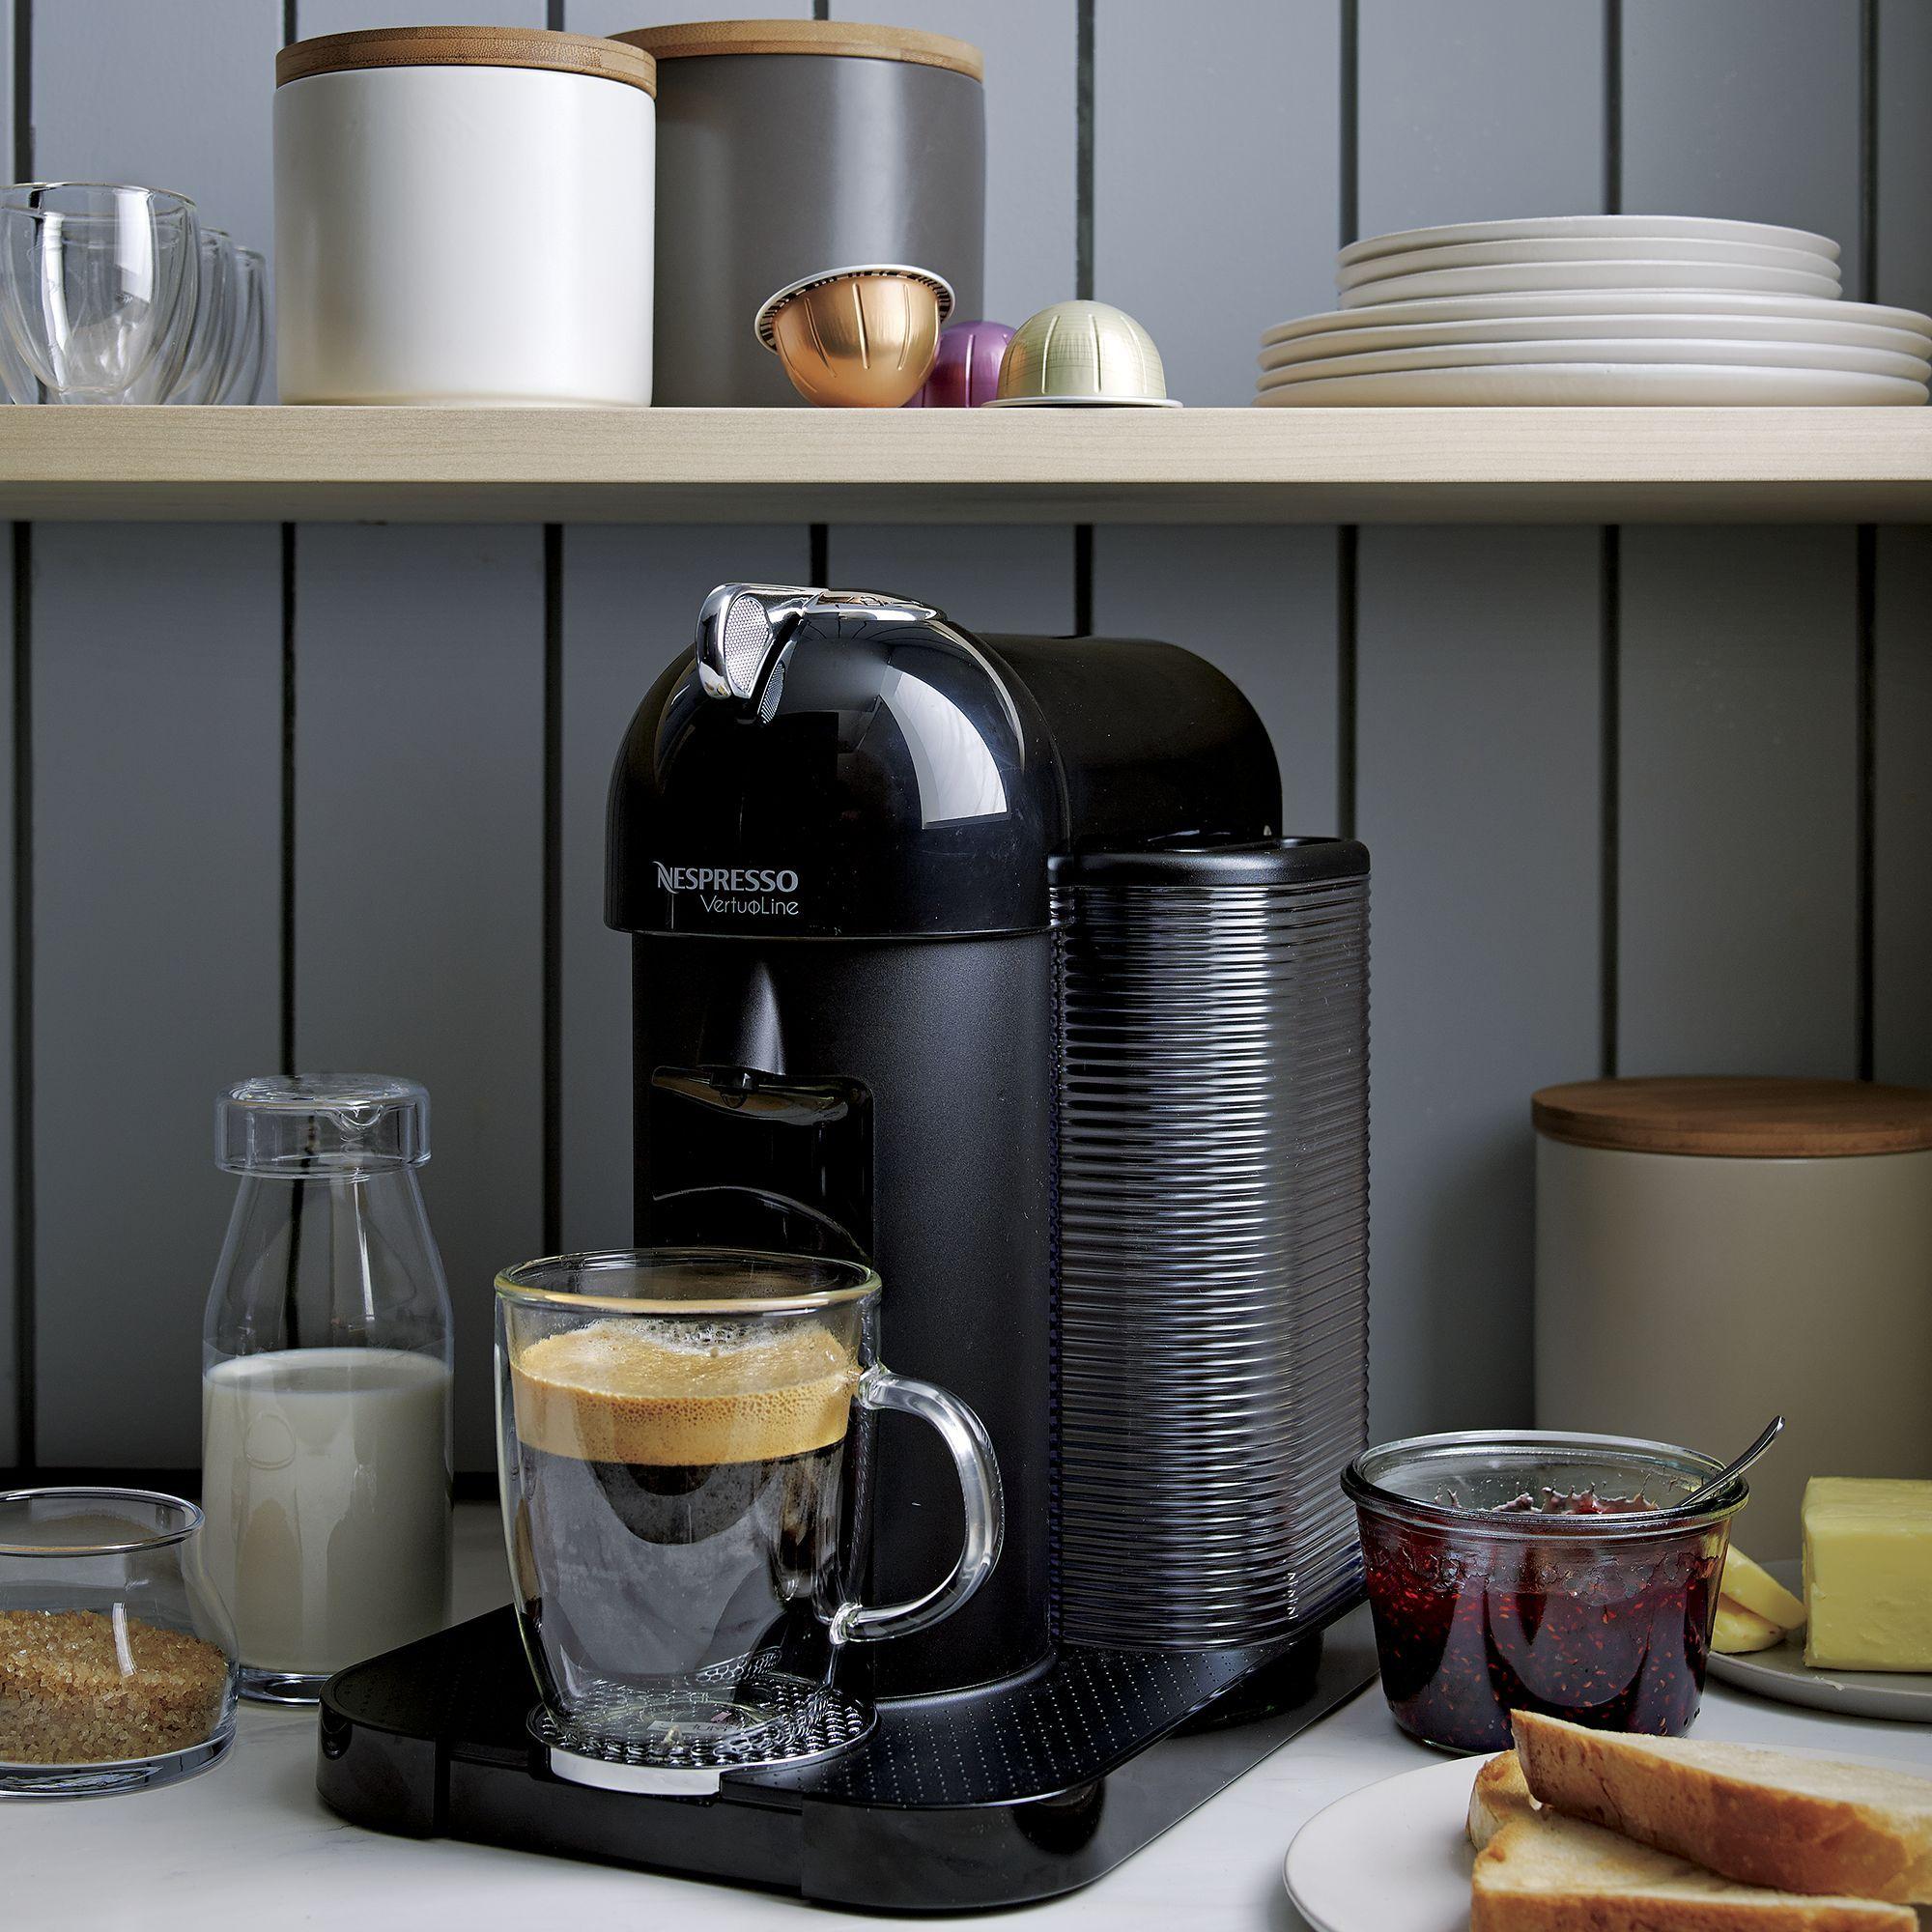 Nespresso By Breville Vertuoline Black Coffee Espresso Maker Reviews Crate And Barrel Coffee Canister Crate Barrel Coffee